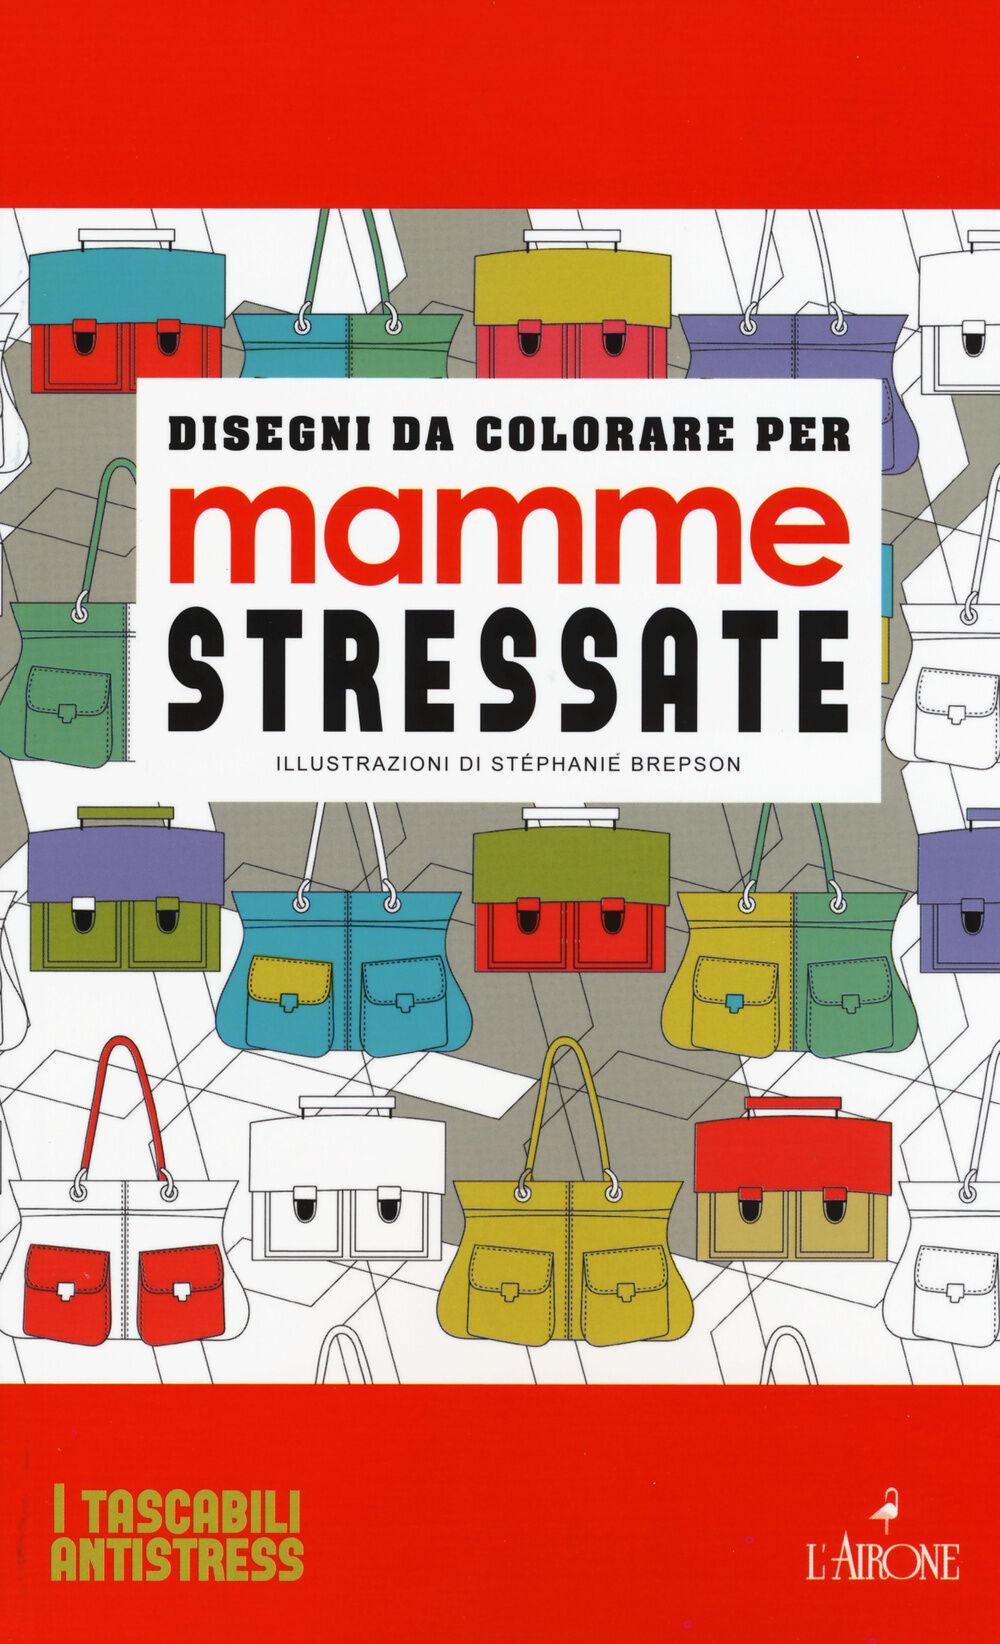 Disegni da colorare per mamme stressate